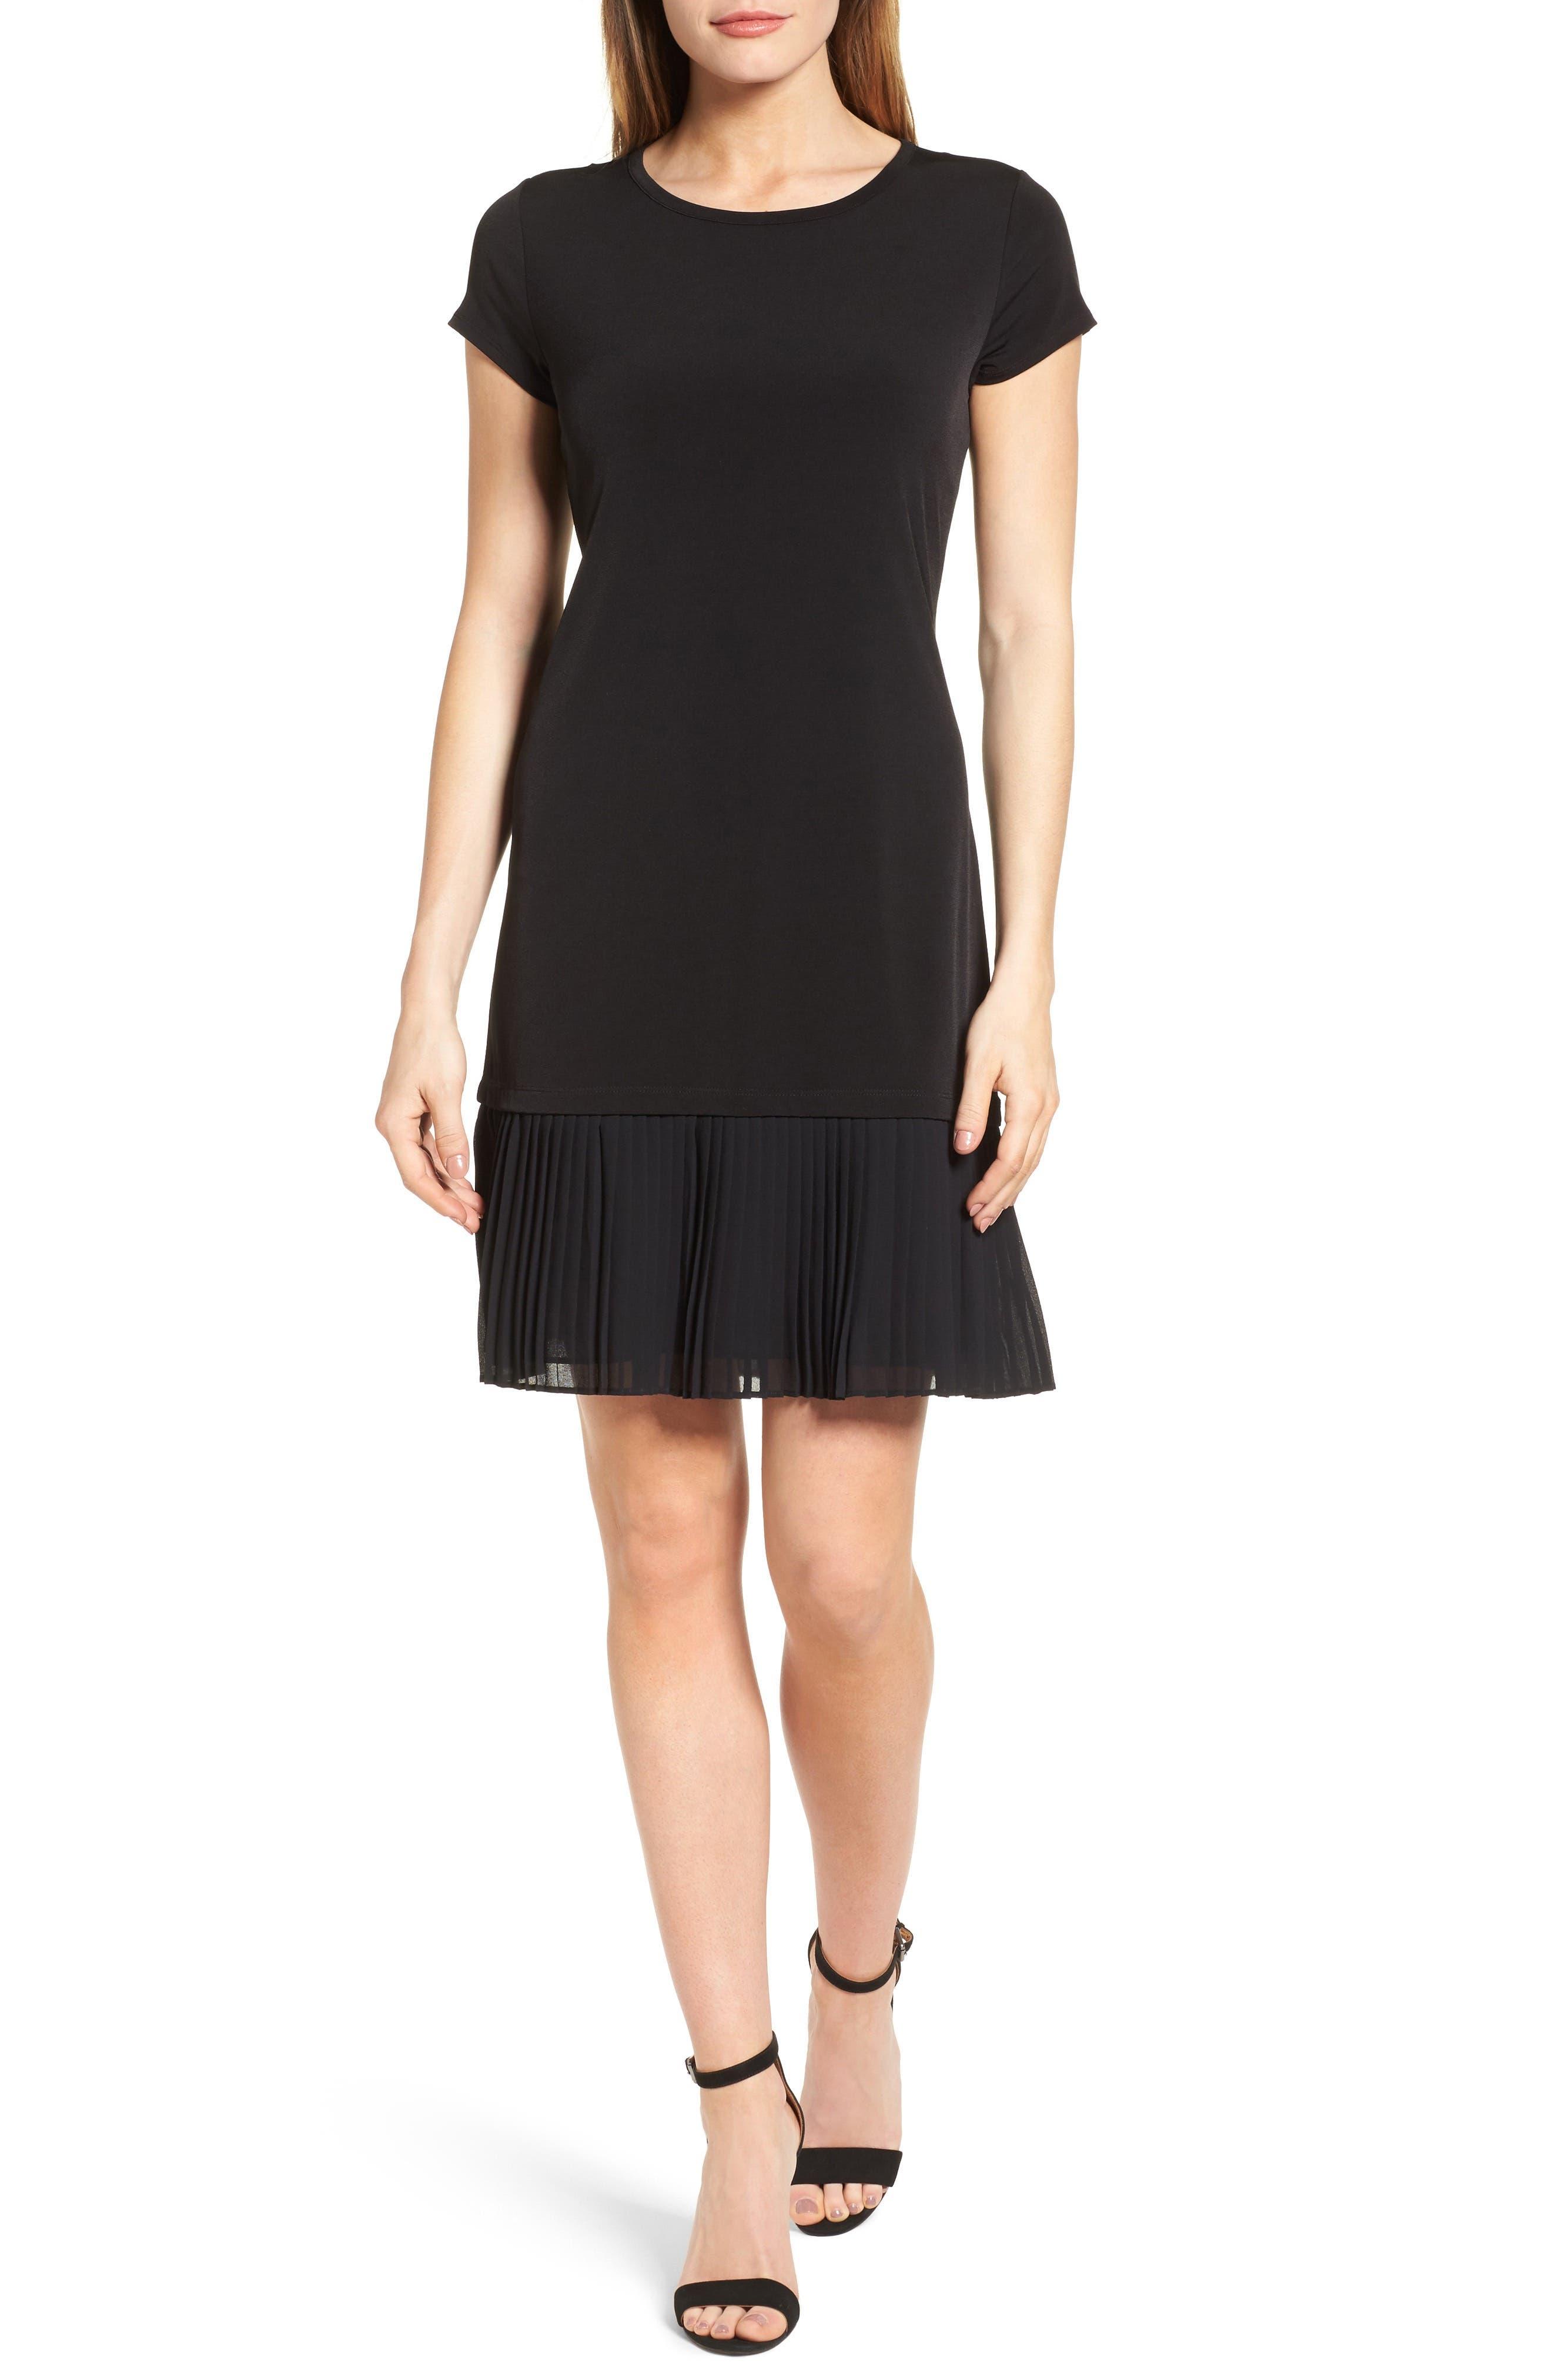 Alternate Image 1 Selected - MICHAEL Michael Kors Pleat Chiffon Hem Jersey Dress